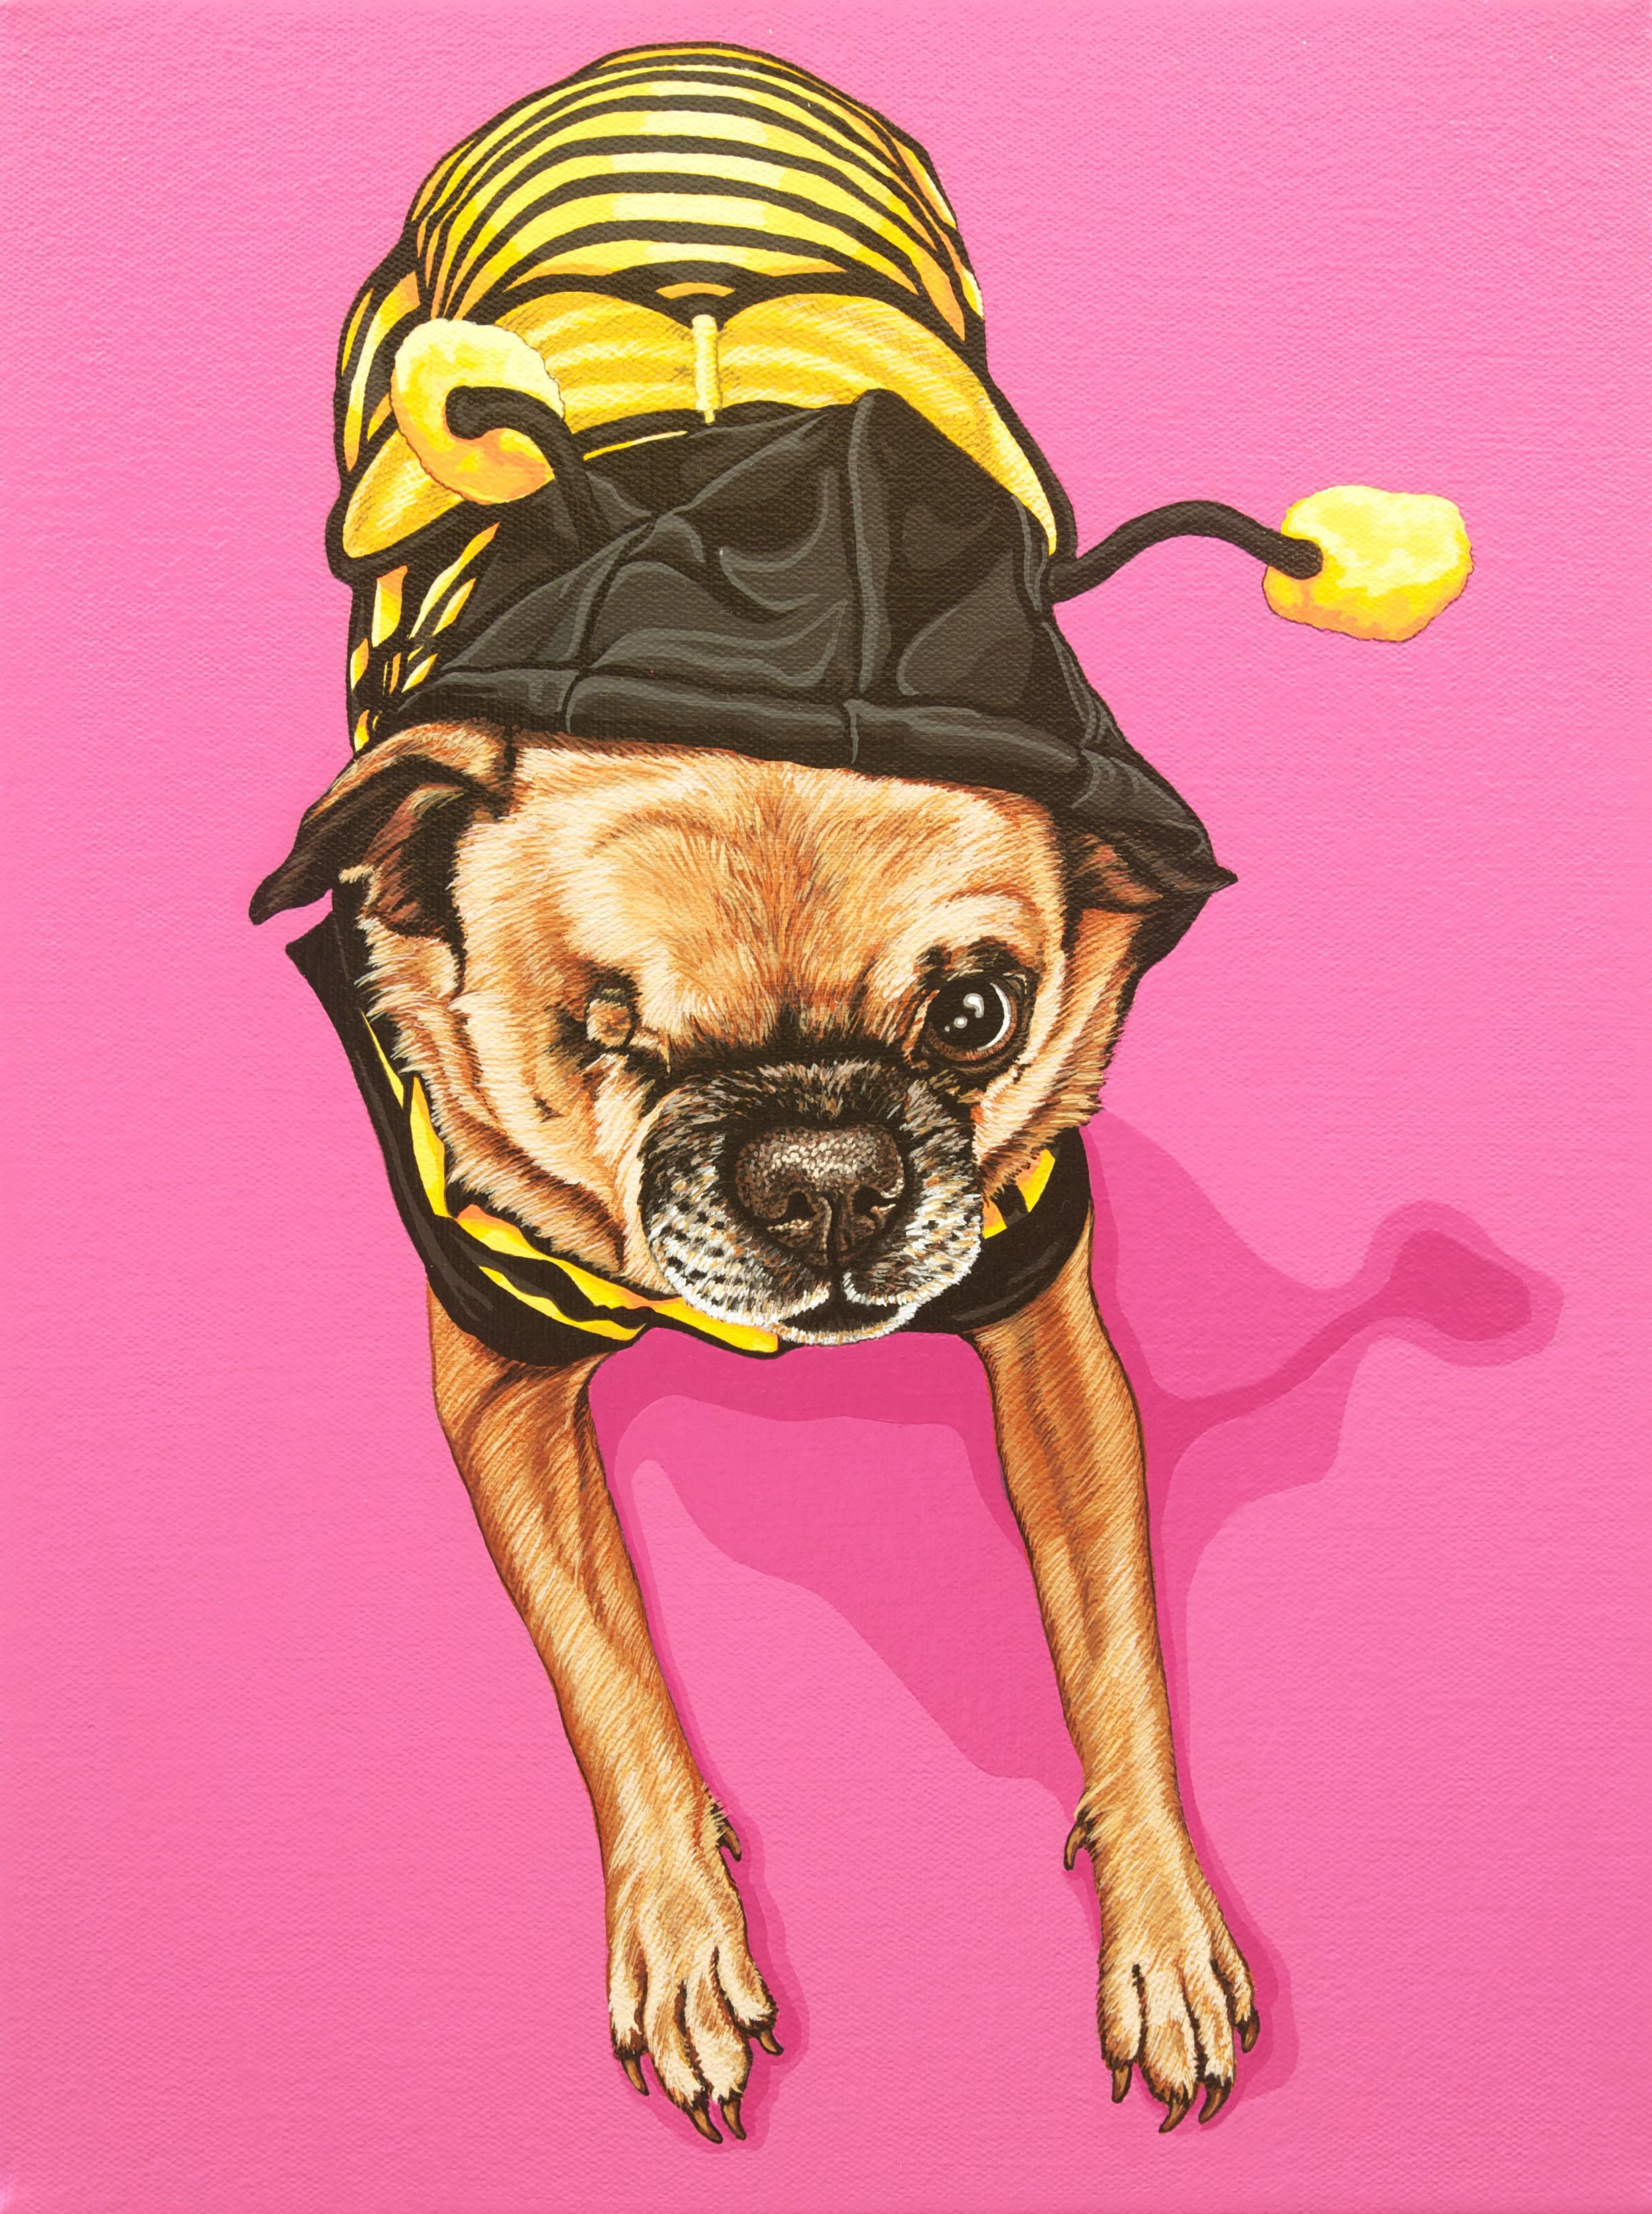 """Penelope"", latex enamel on canvas, 12""x 16"", 2014"